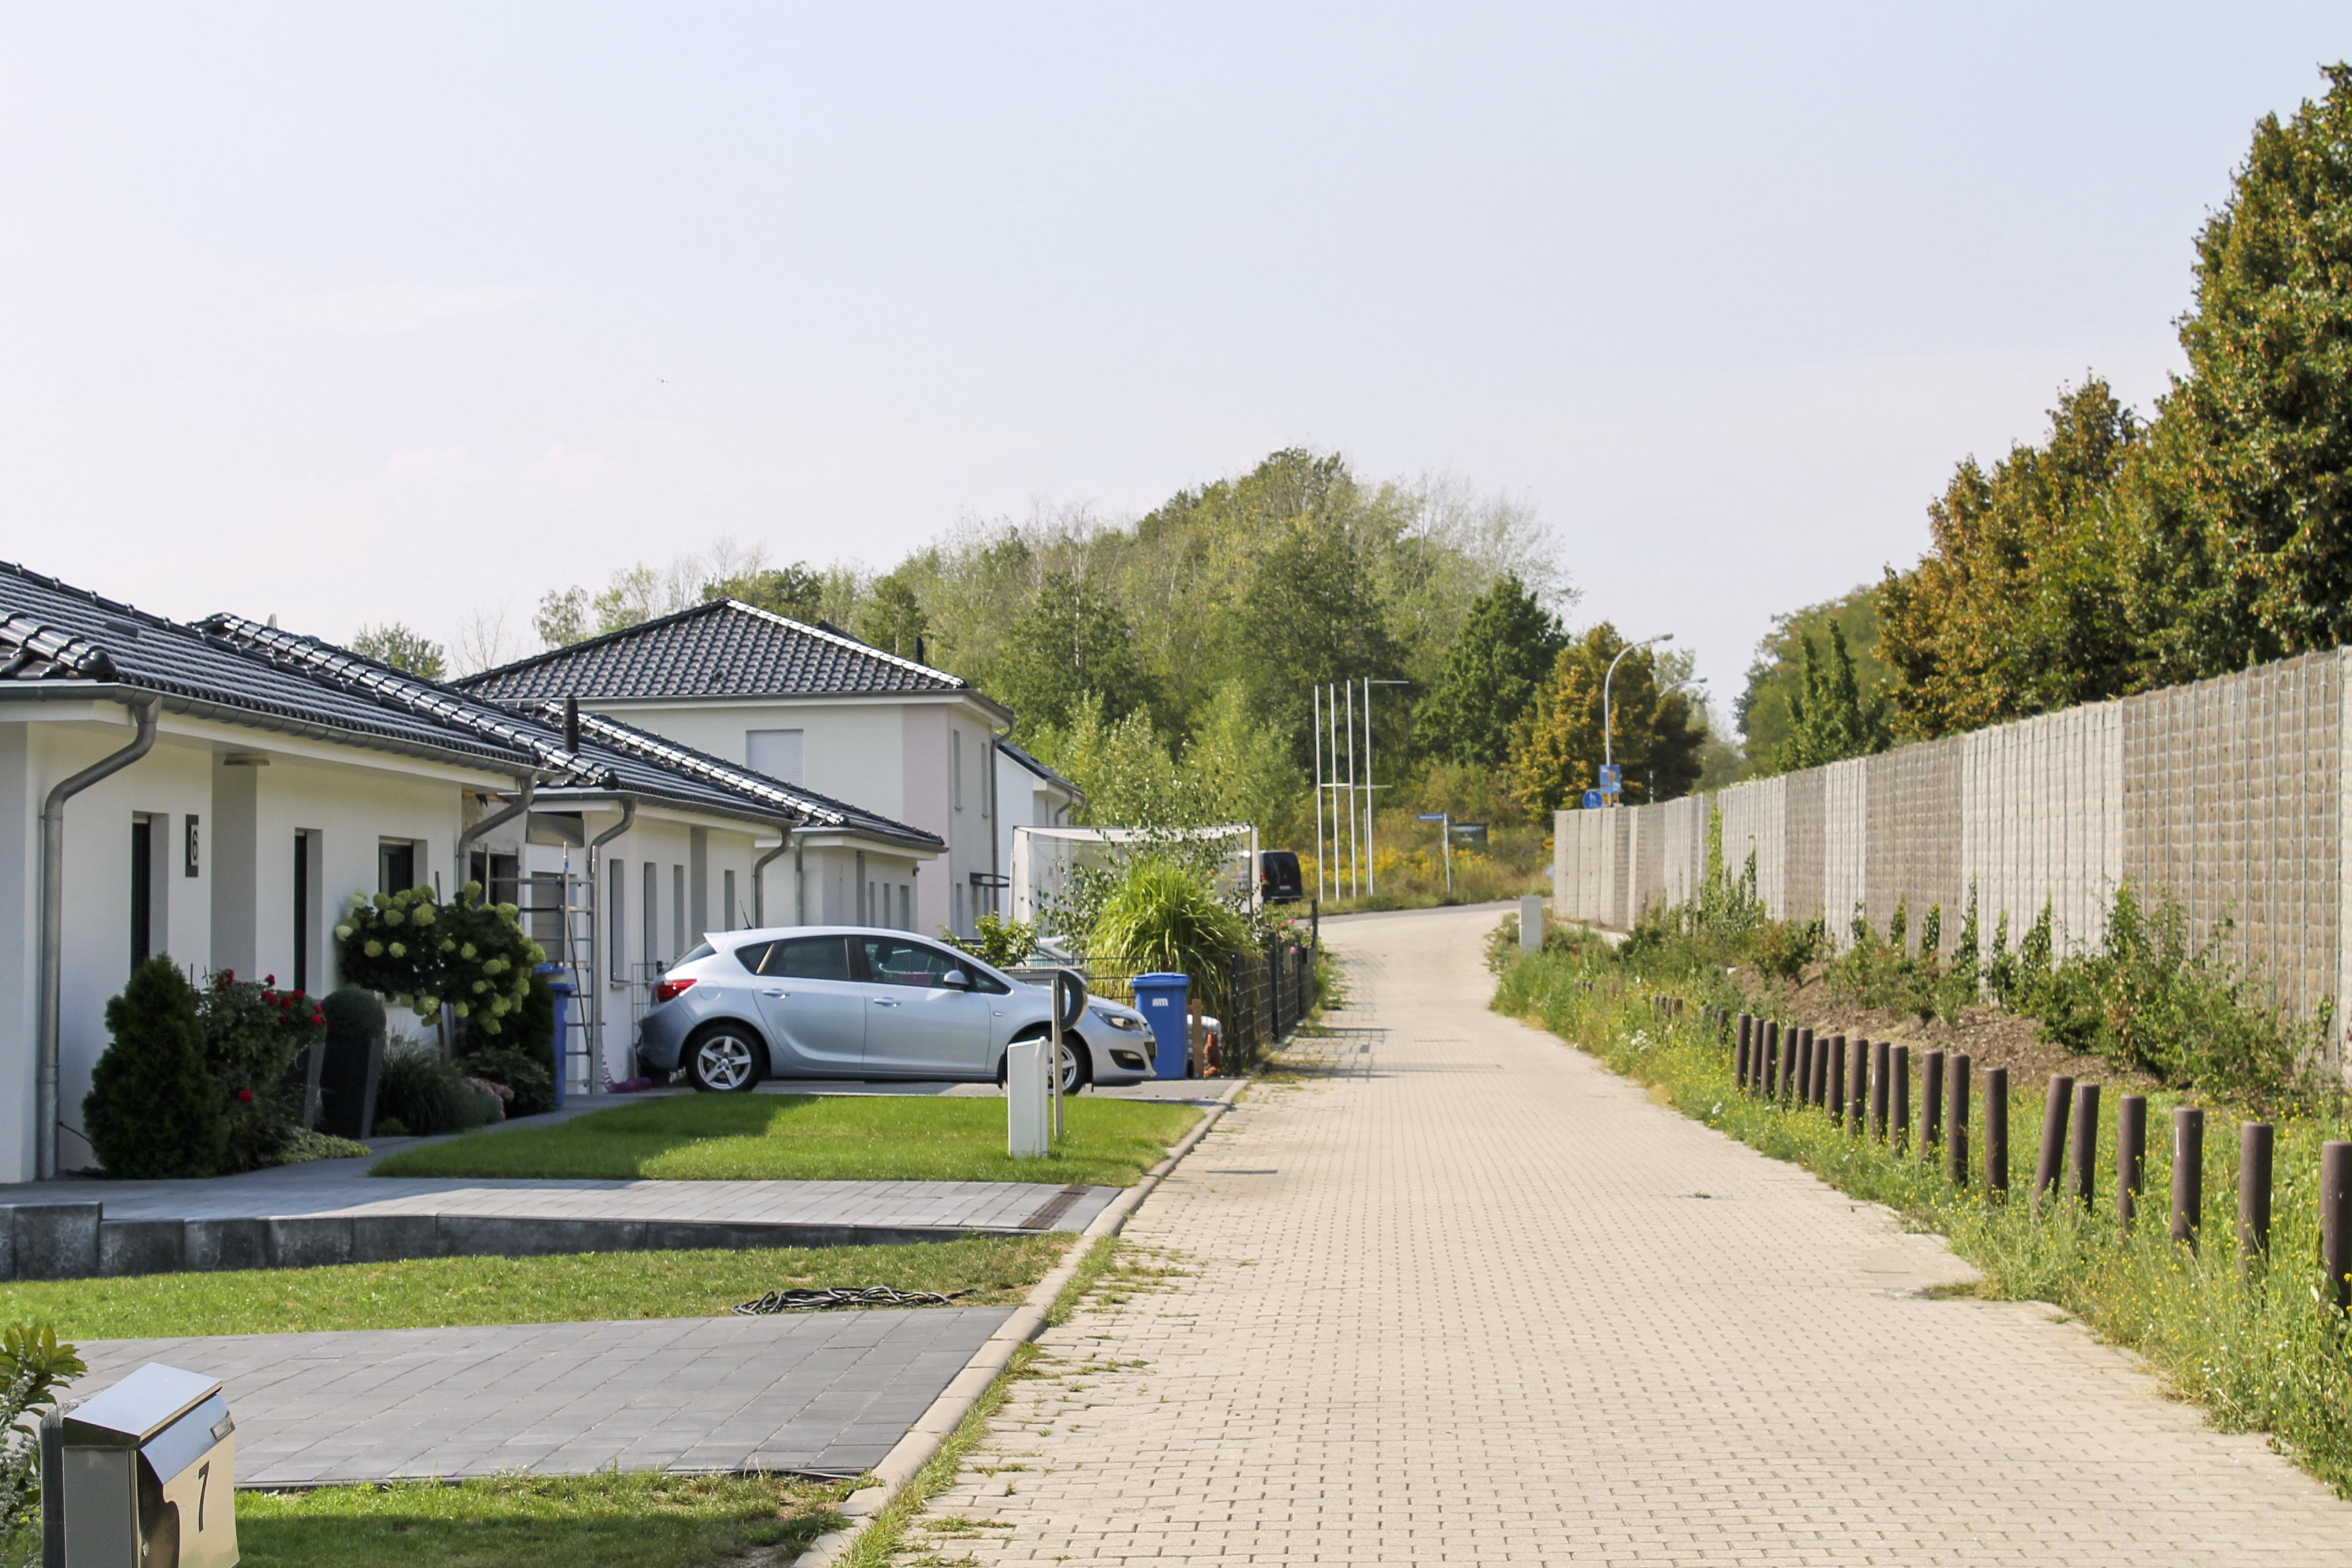 Teltow Ruhlsdorf